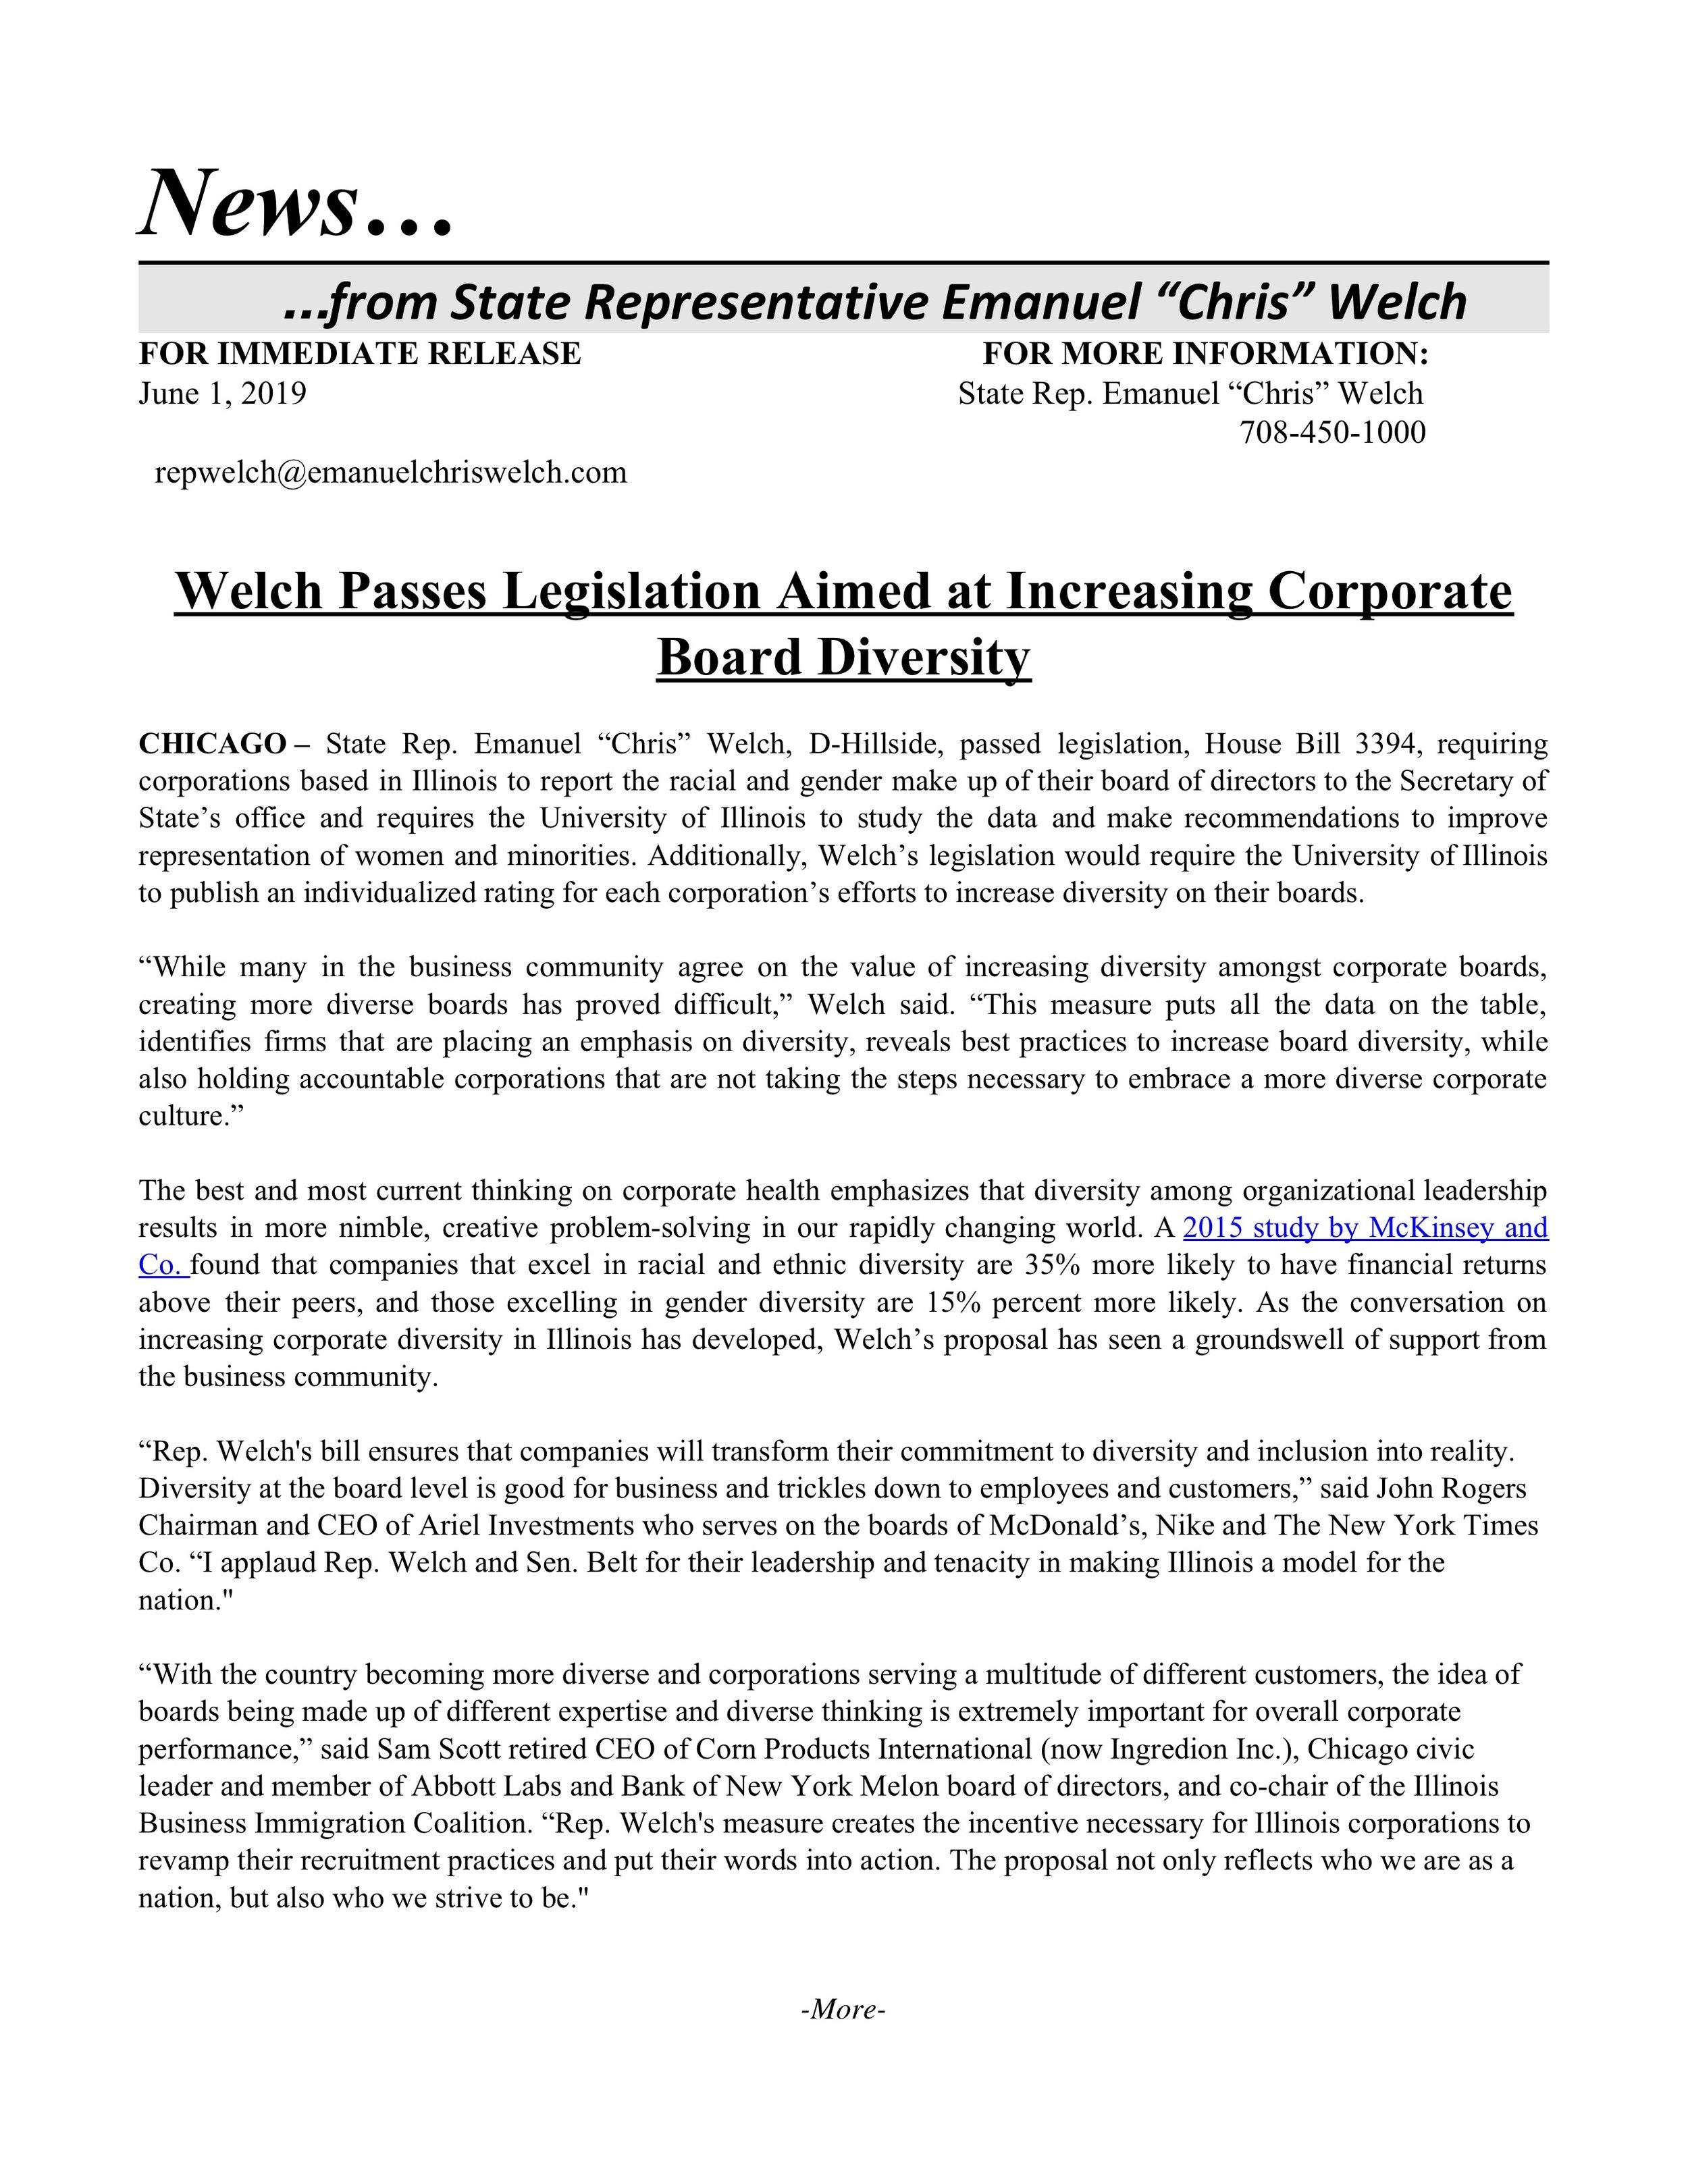 Welch Passes Legislation Aimed at Increasing Corporate Board Diversity